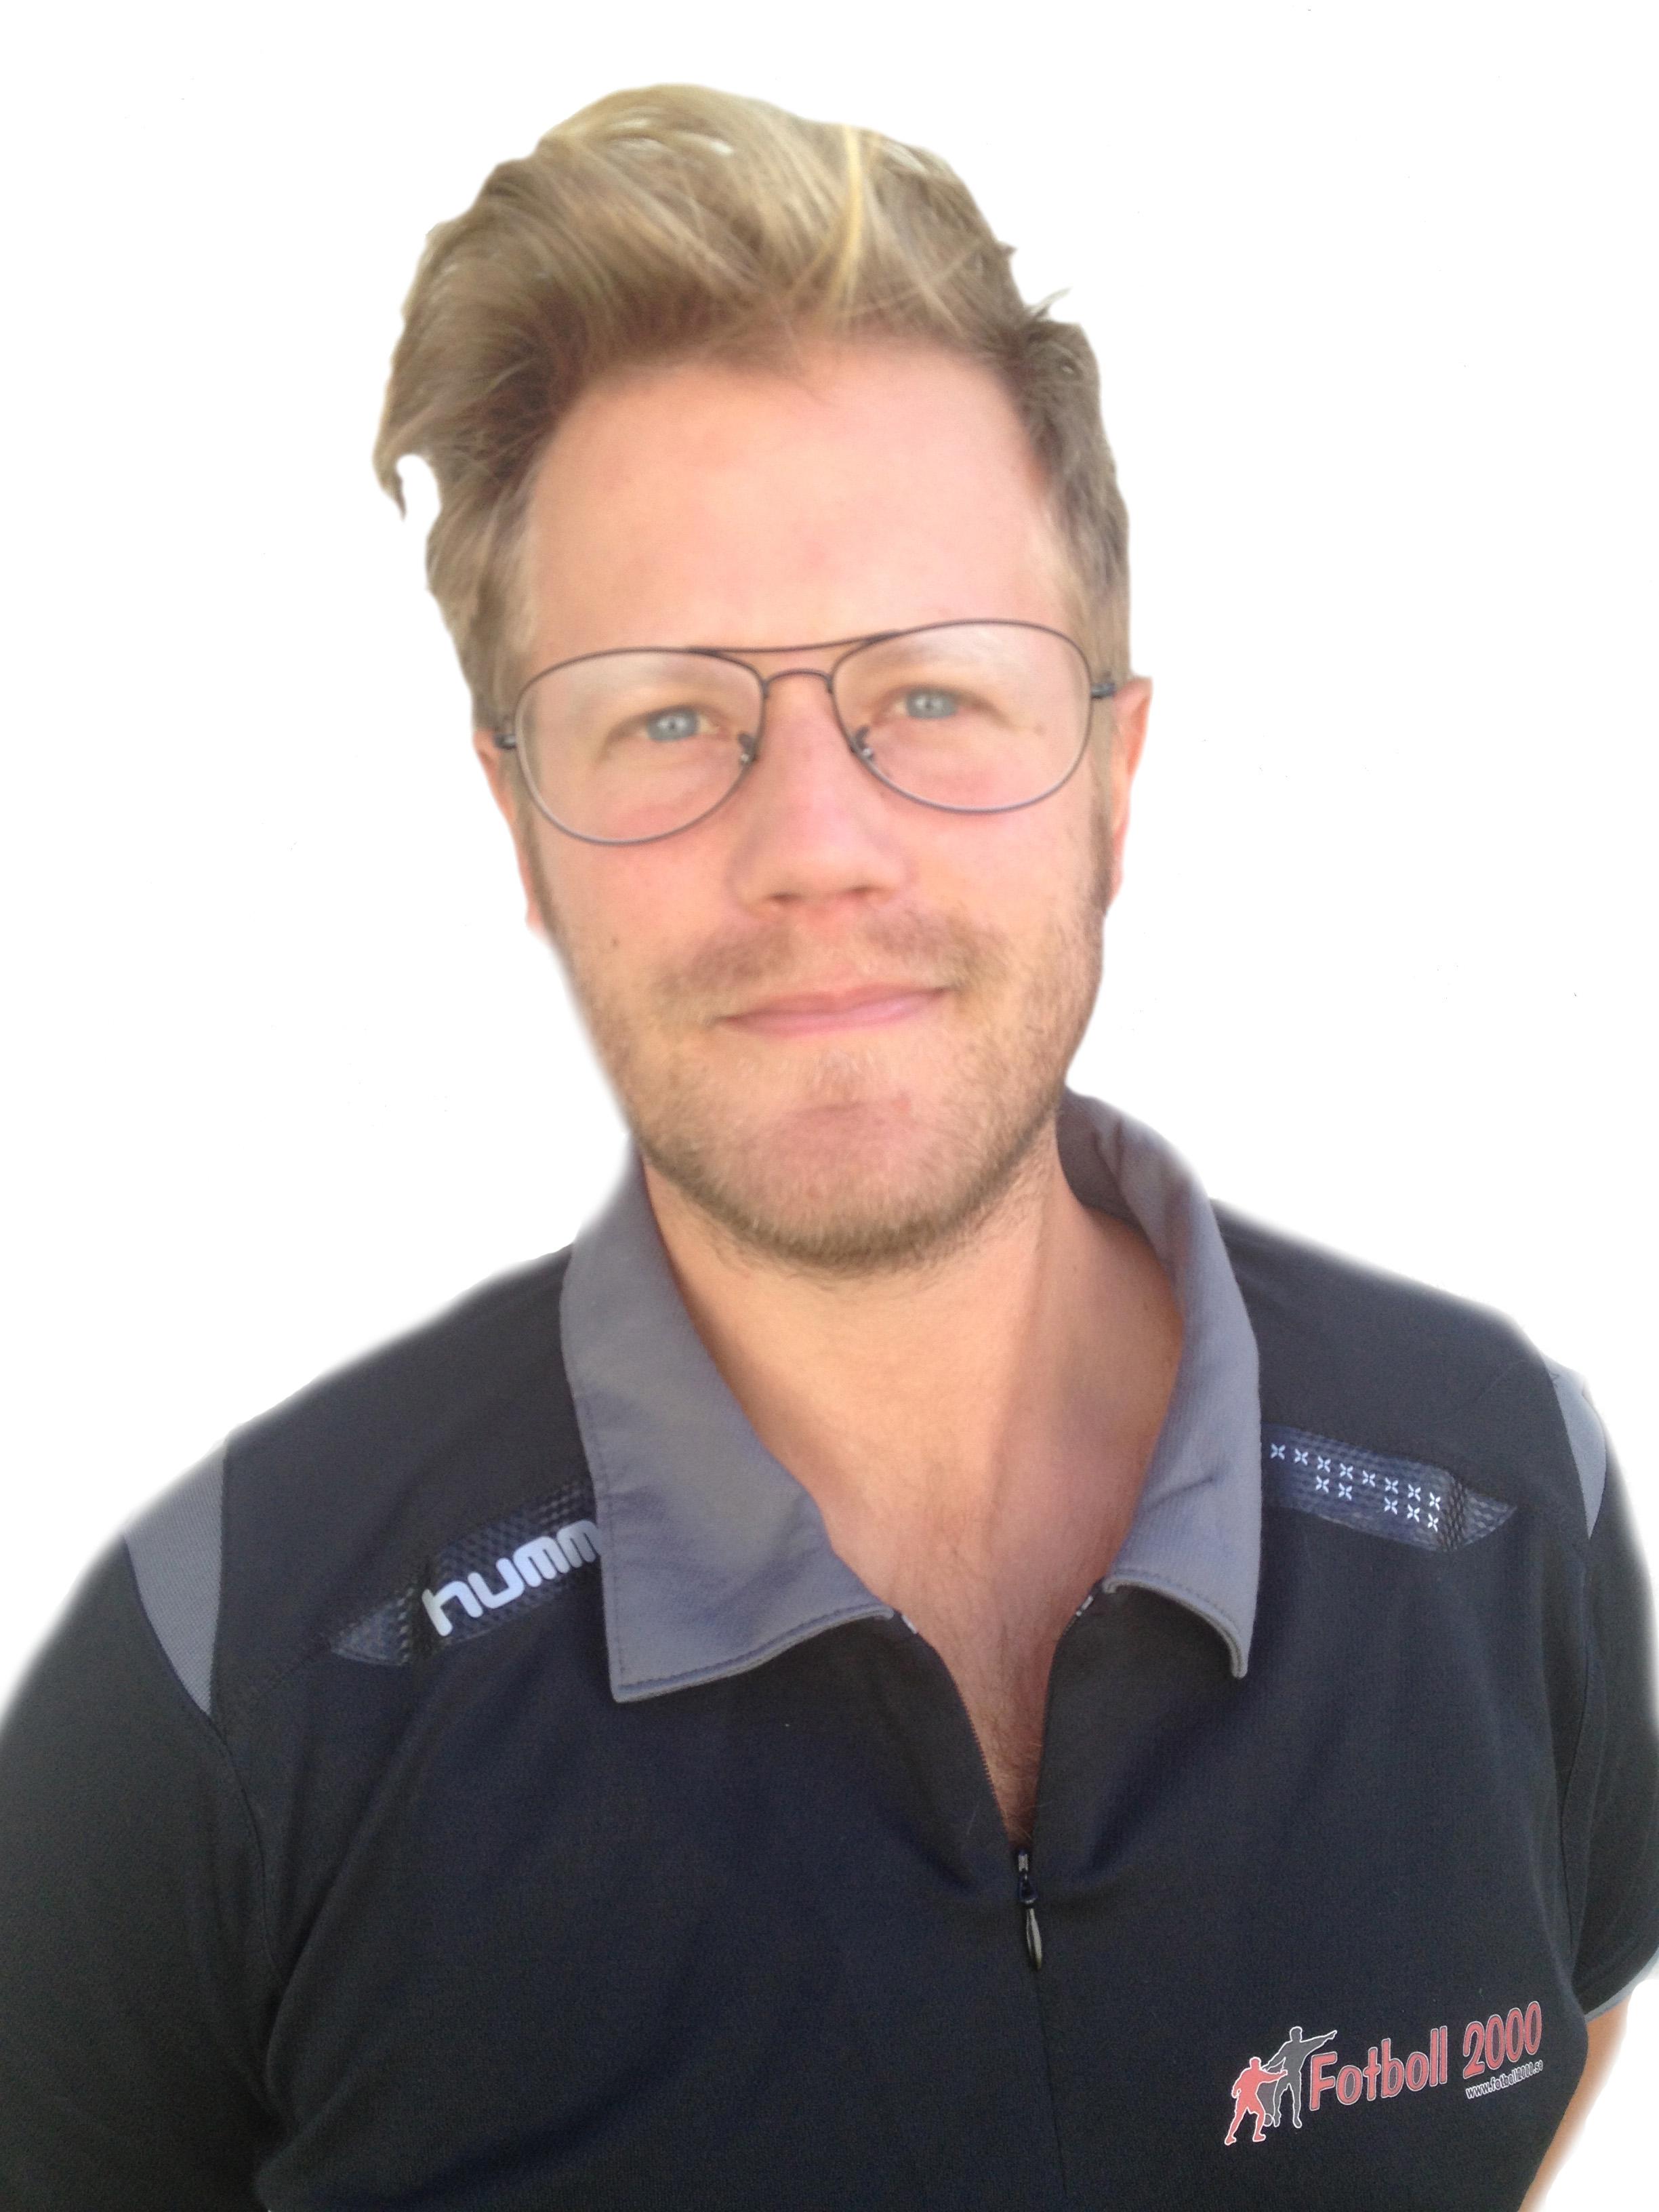 Fotboll 2000's Johan Nexborn